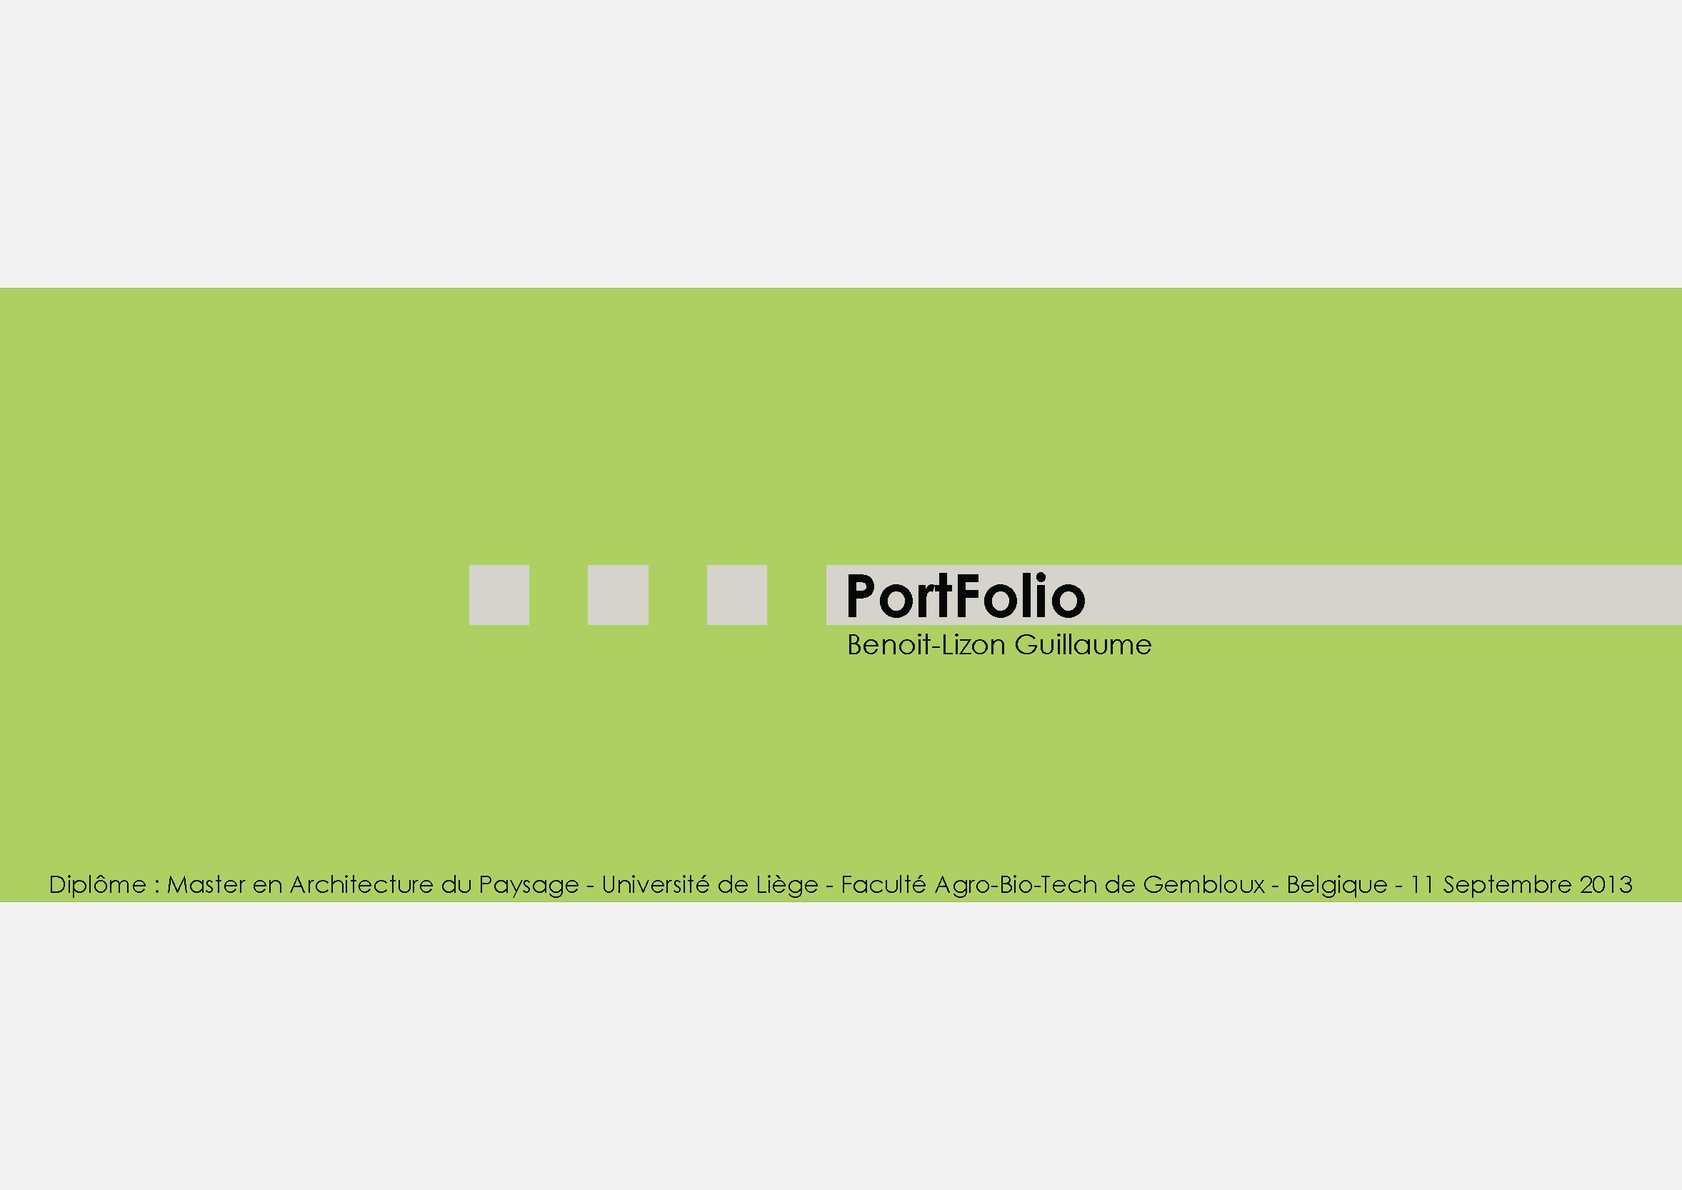 Calam o portfolio benoit lizon guillaume architecte for Architecte paysagiste formation